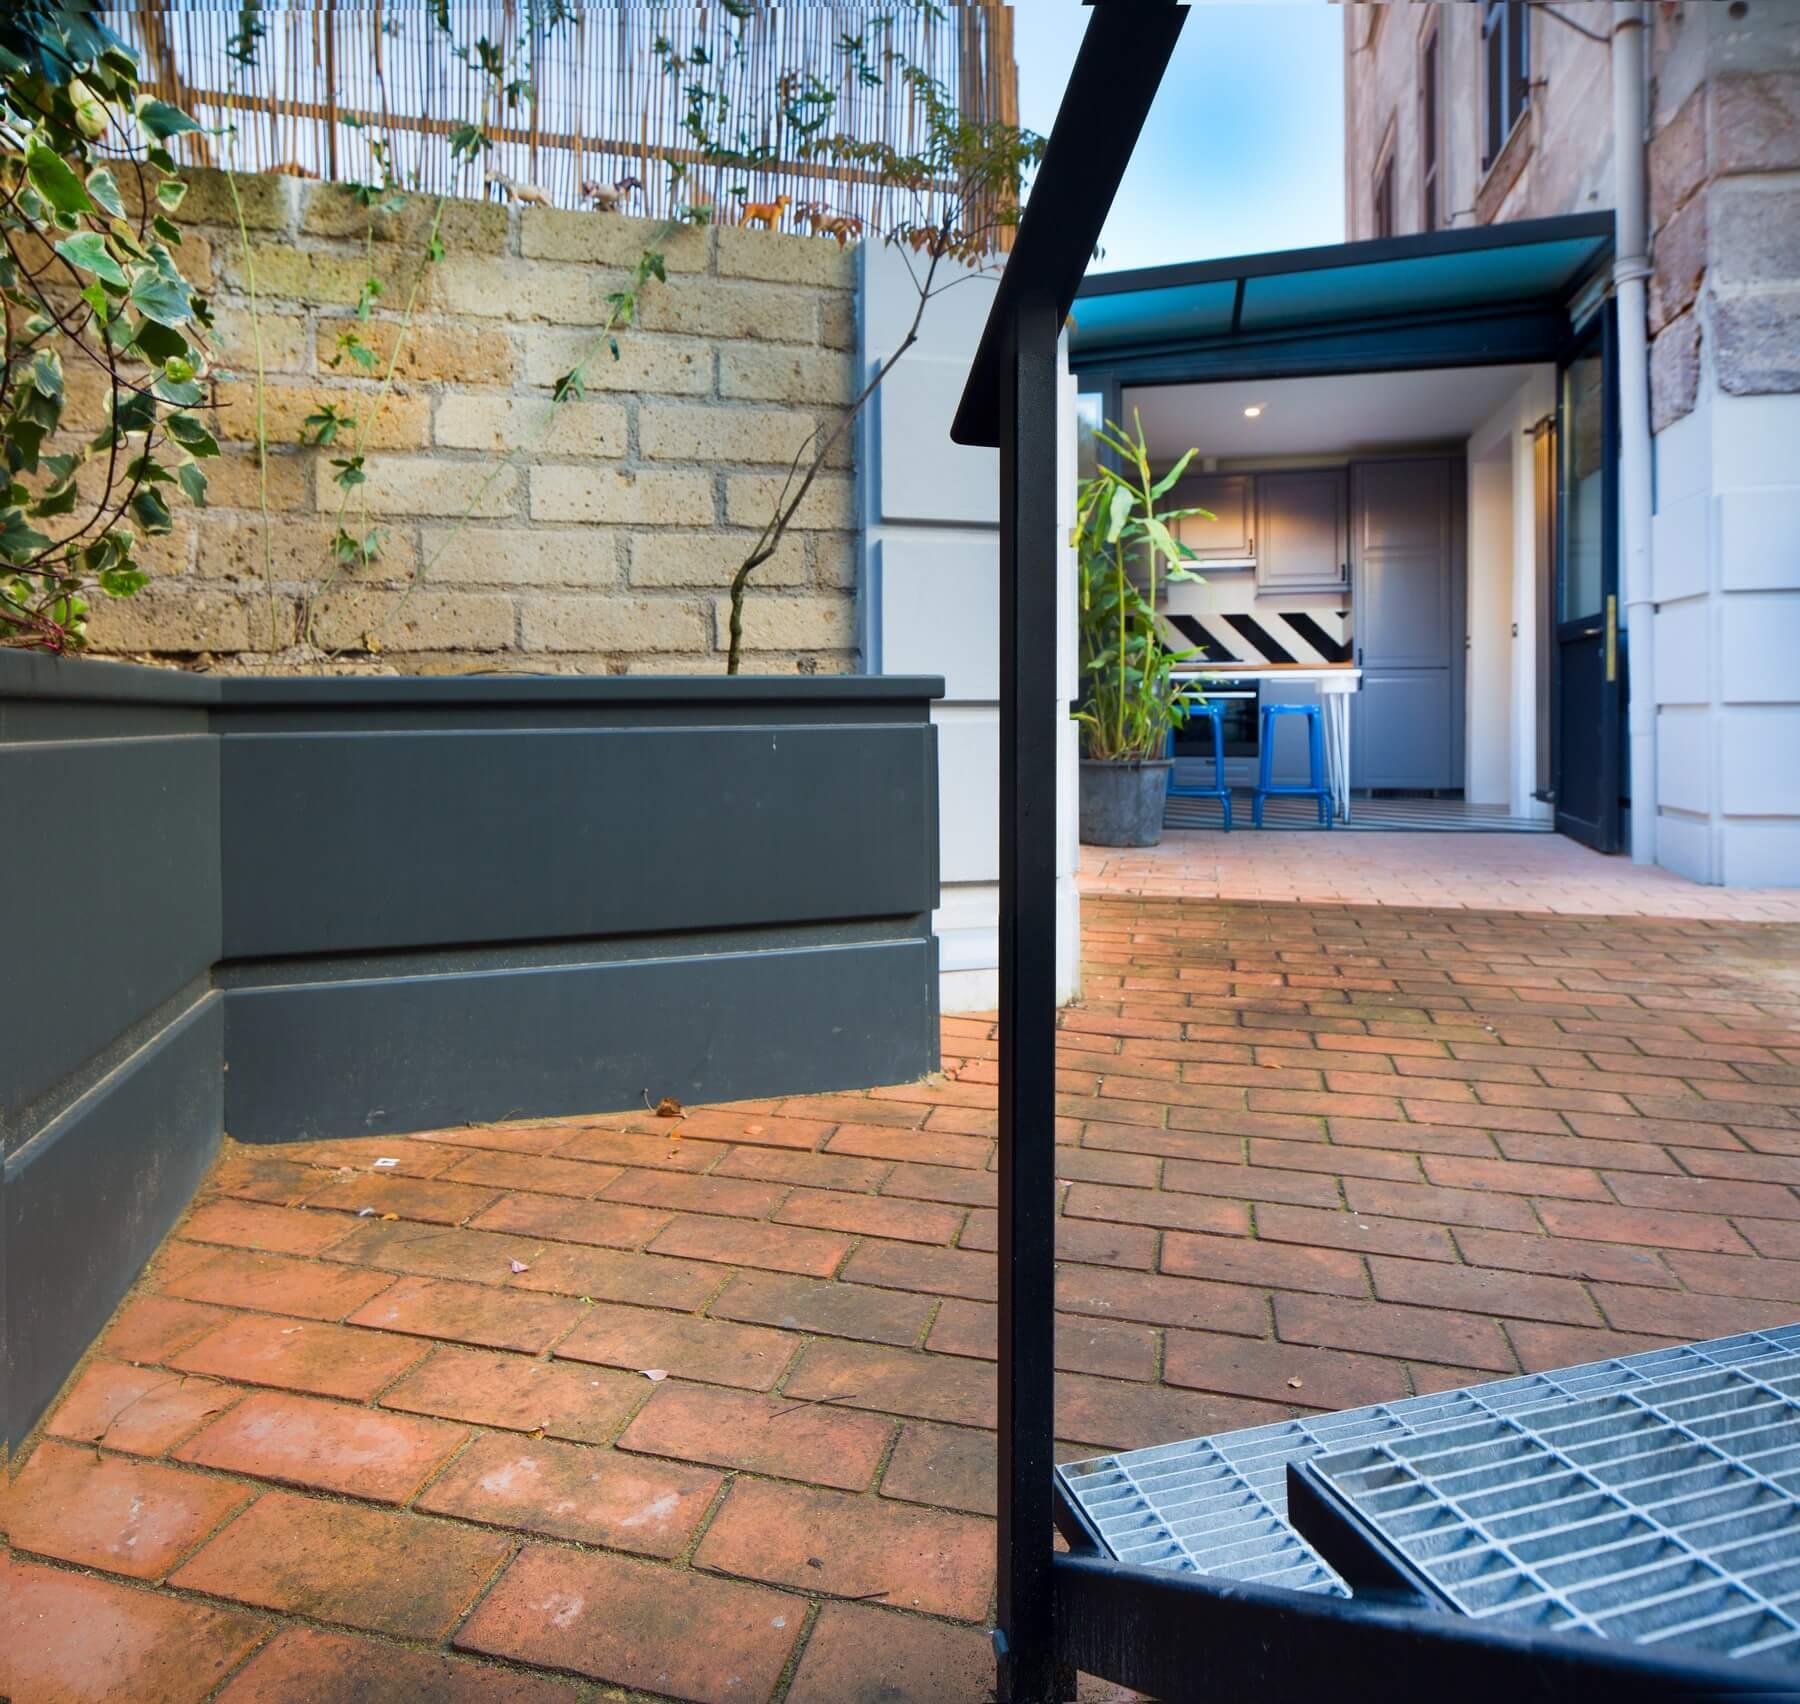 appartamento_san_saba_roma_architetto_morgantini